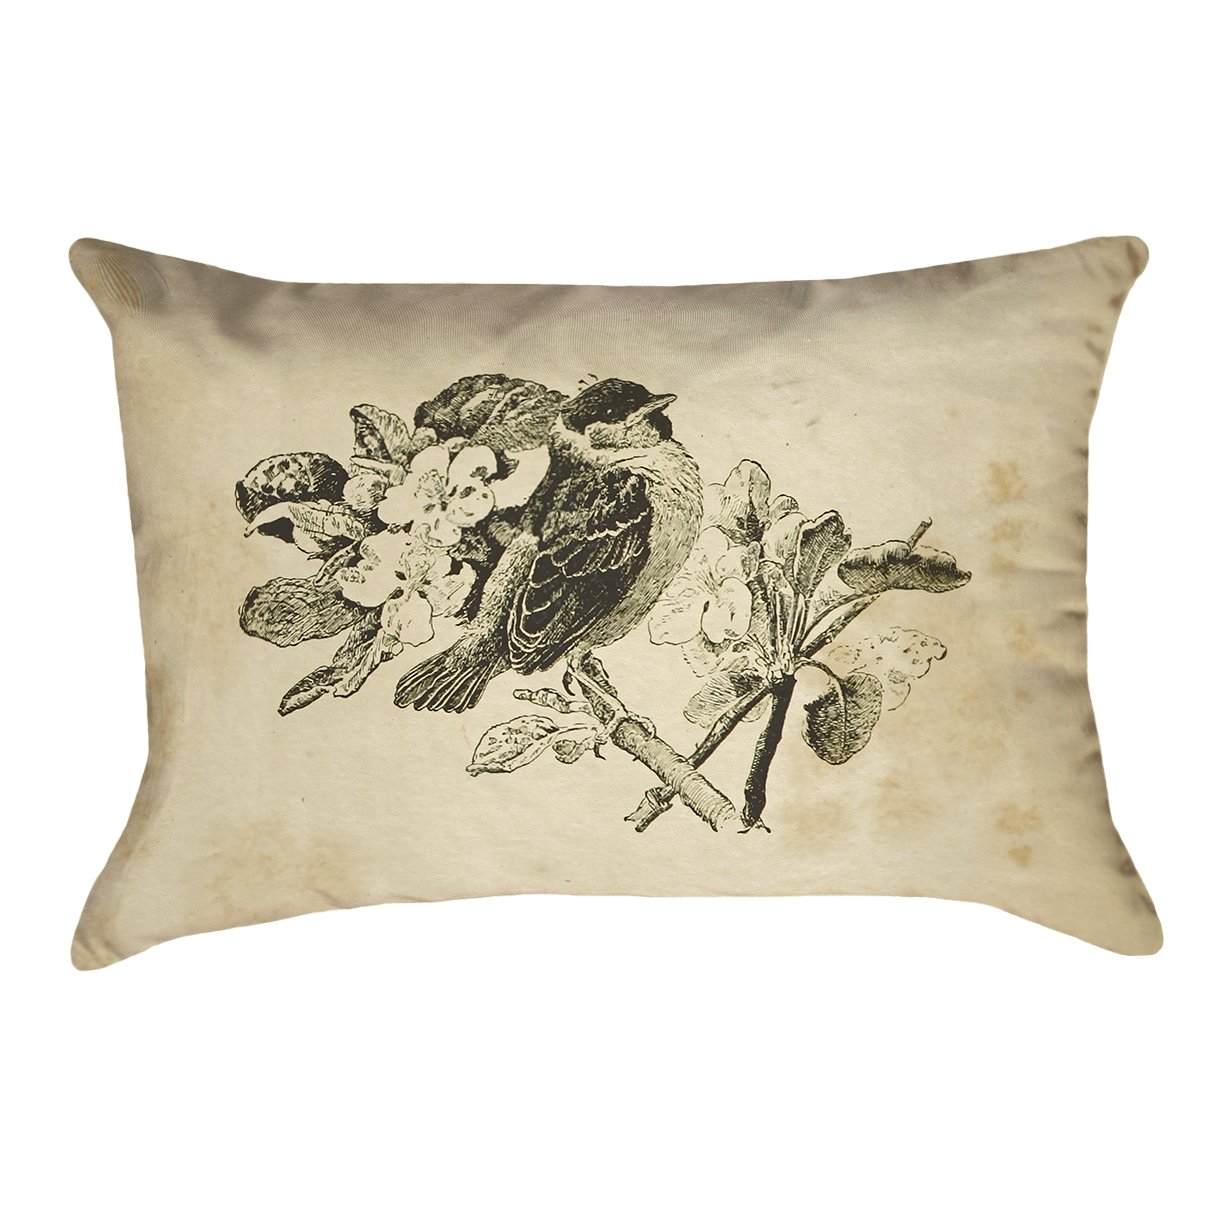 ArtVerse Katelyn Smith 26 x 26 Spun Polyester Double Sided Print with Concealed Zipper /& Insert Vintage Sepia Bird Pillow SMI133P2626B